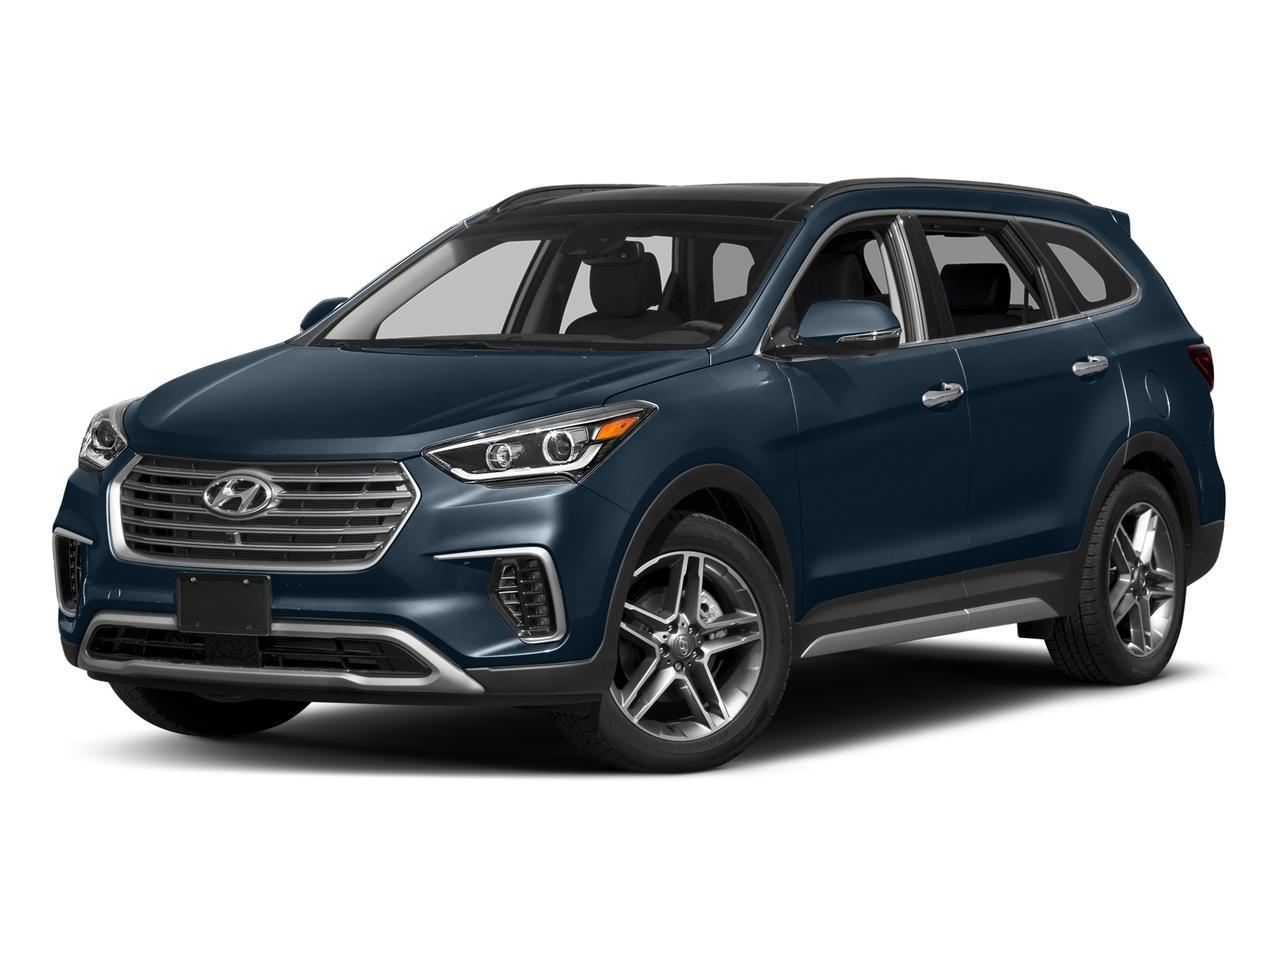 2018 Hyundai Santa Fe Vehicle Photo in Plainfield, IL 60586